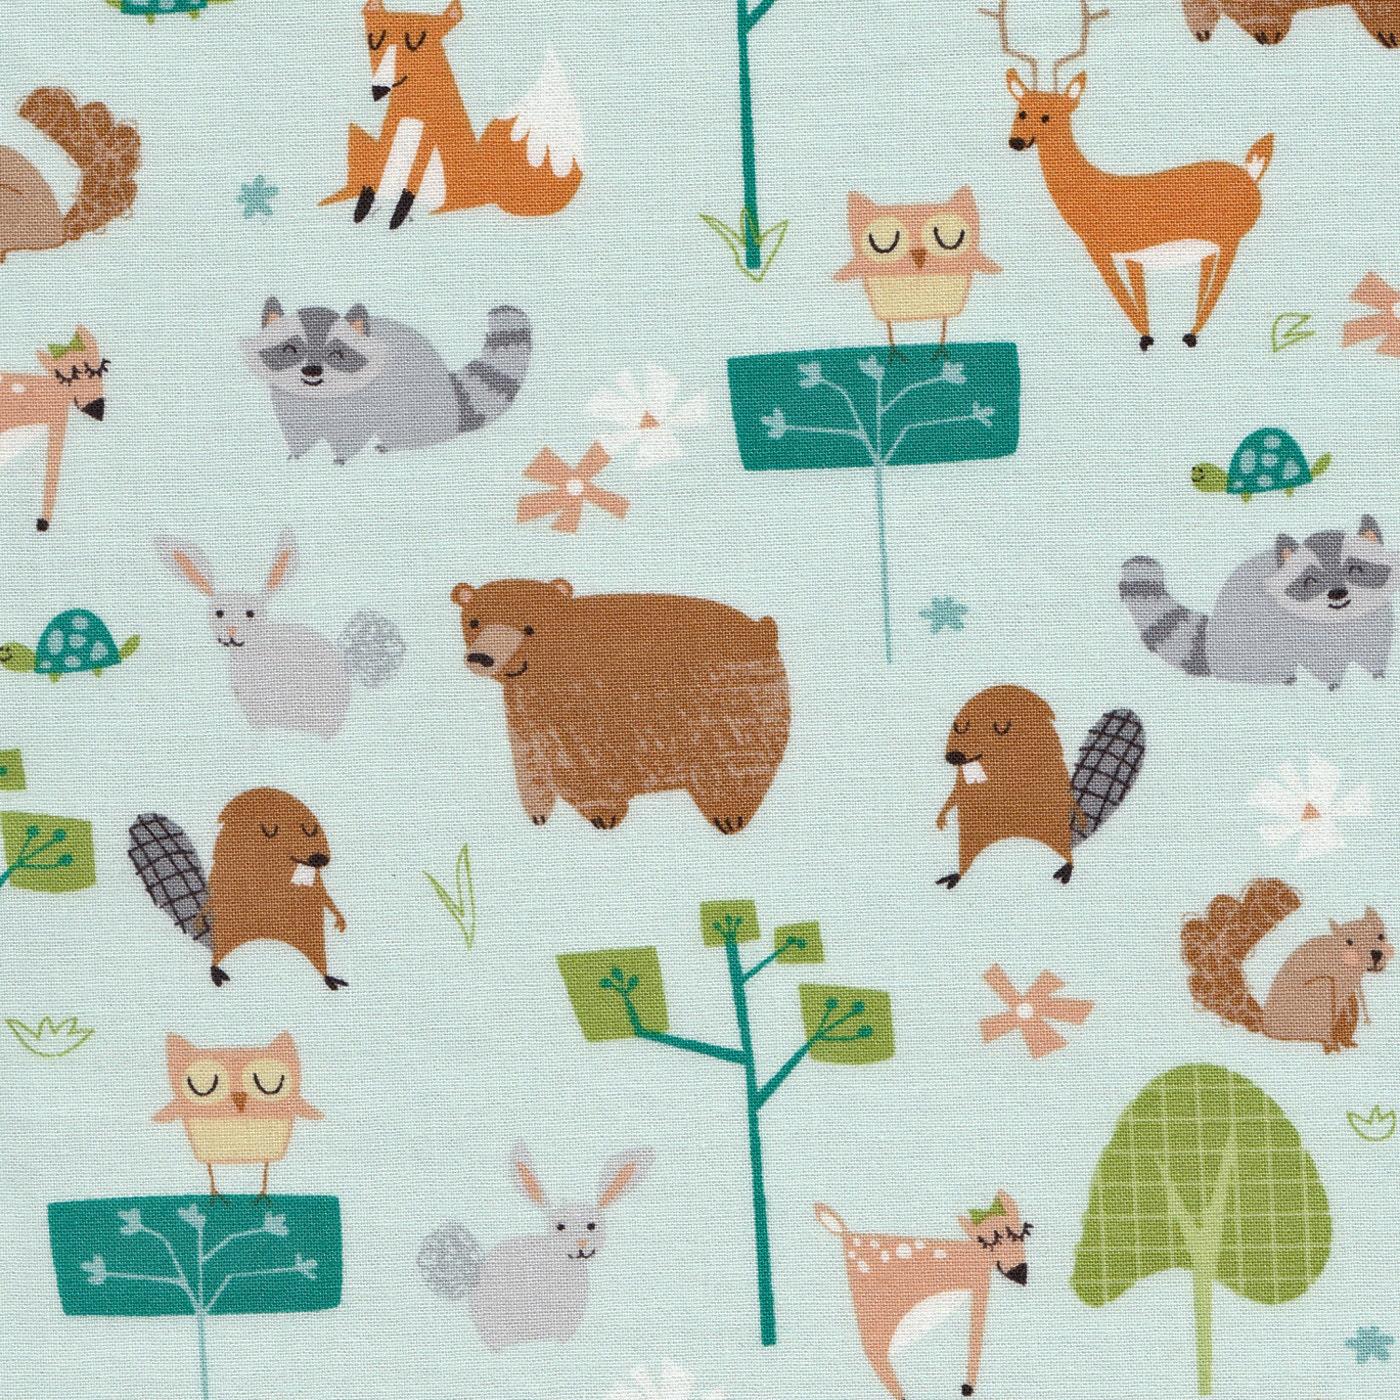 Woodland Animal Fabric By Wilmington Prints